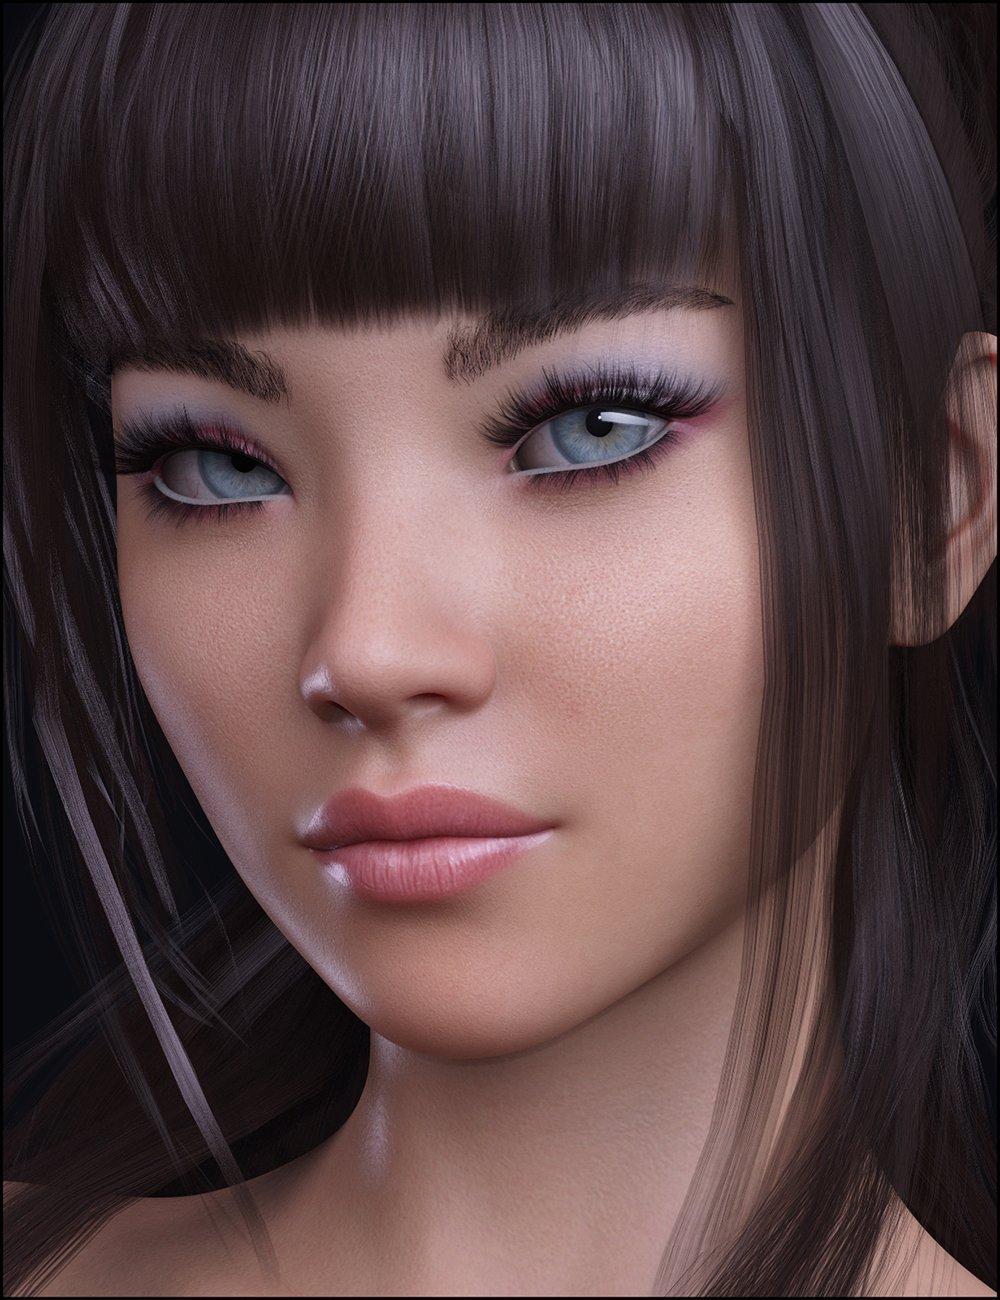 Ajisai for Genesis 8 and 8.1 Female by: JessaiiDemonicaEvilius, 3D Models by Daz 3D